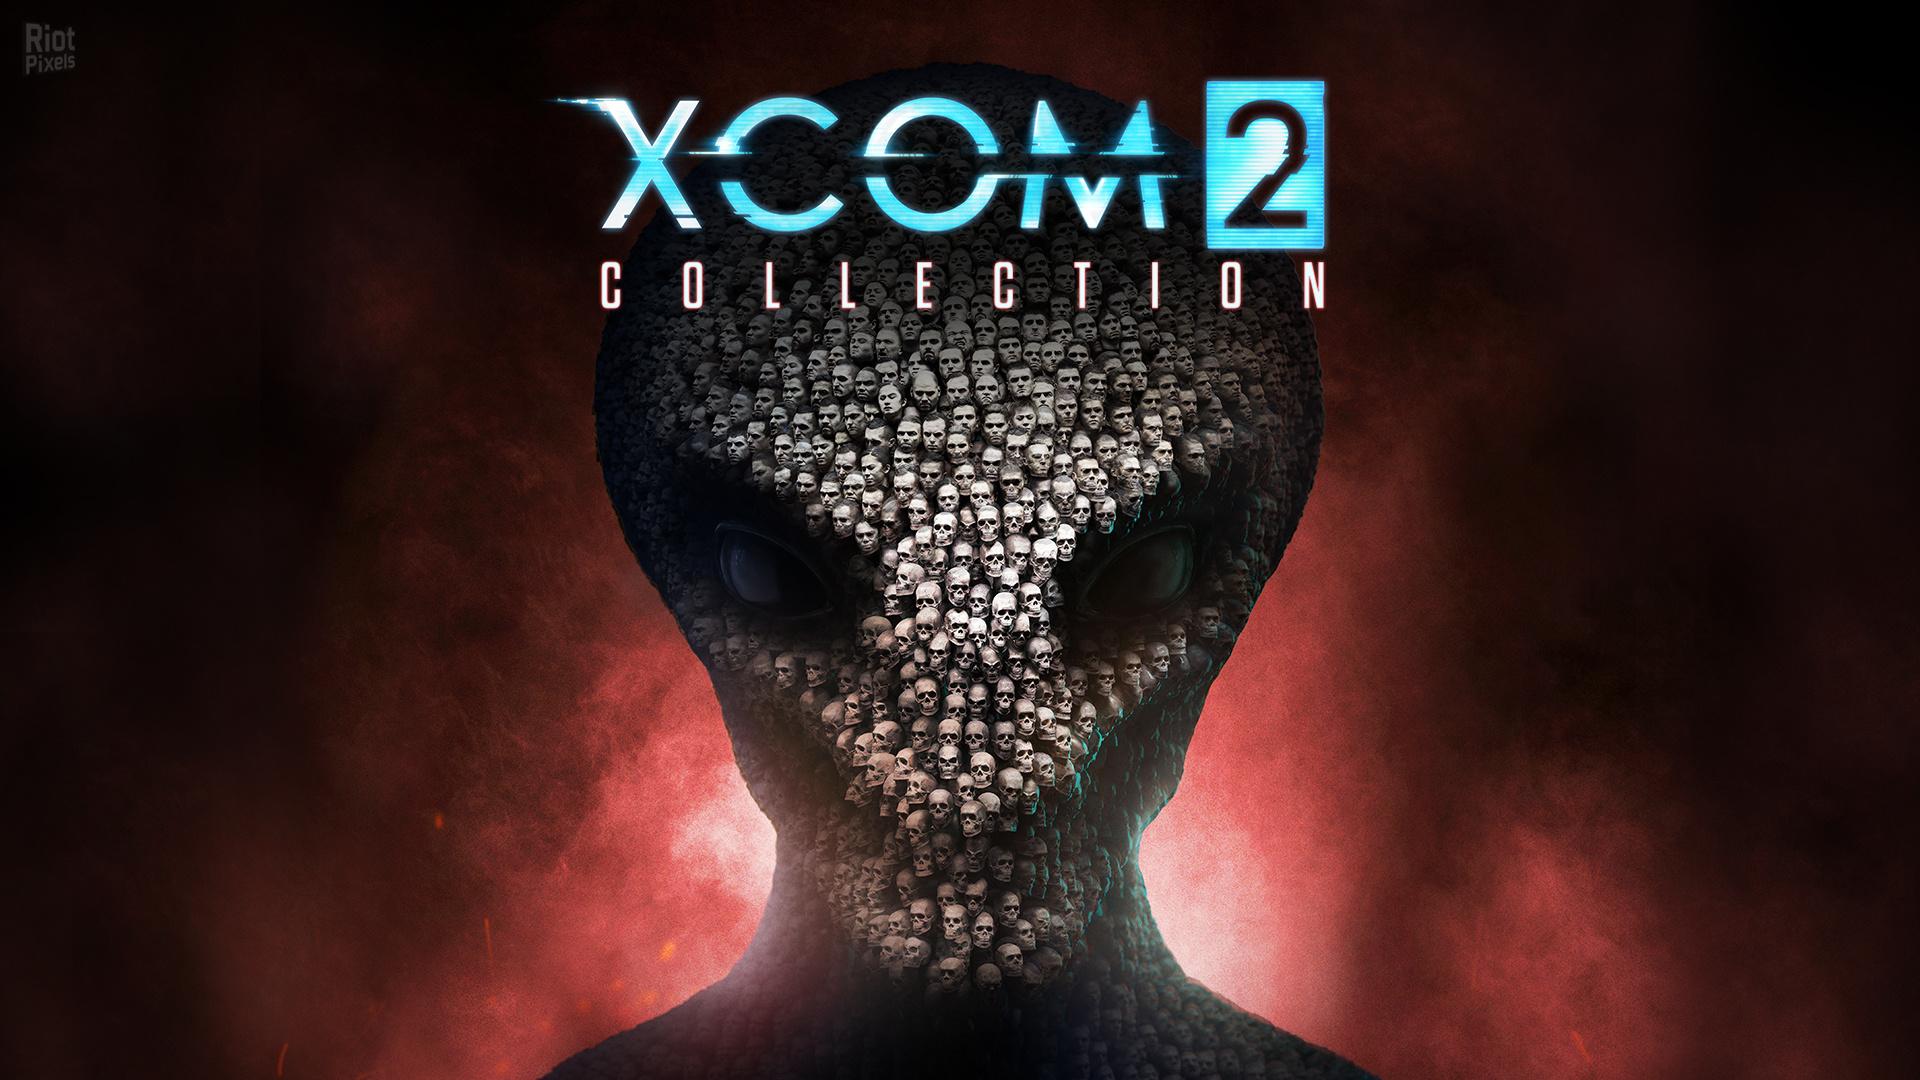 artwork.xcom-2-collection.1920x1080.2020-06-01.7.jpg